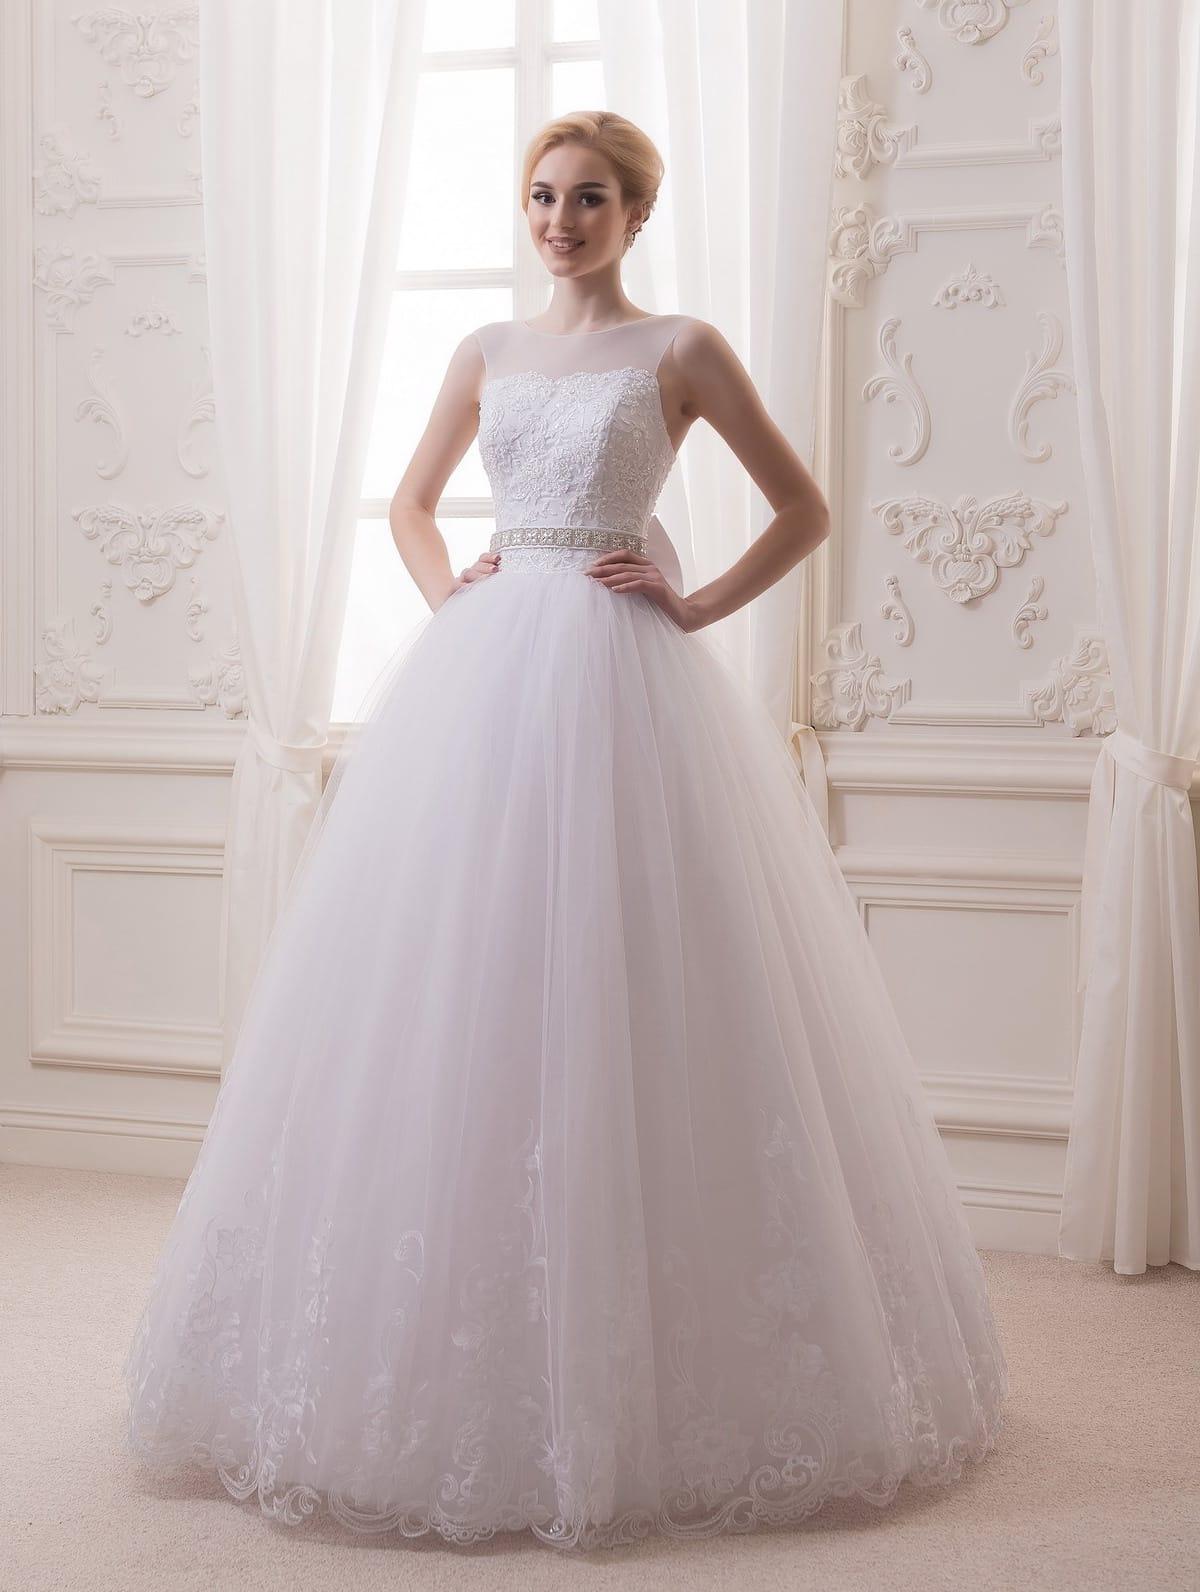 Cyra abiti da sposa prezzi bassi online - SposatelierSposatelier